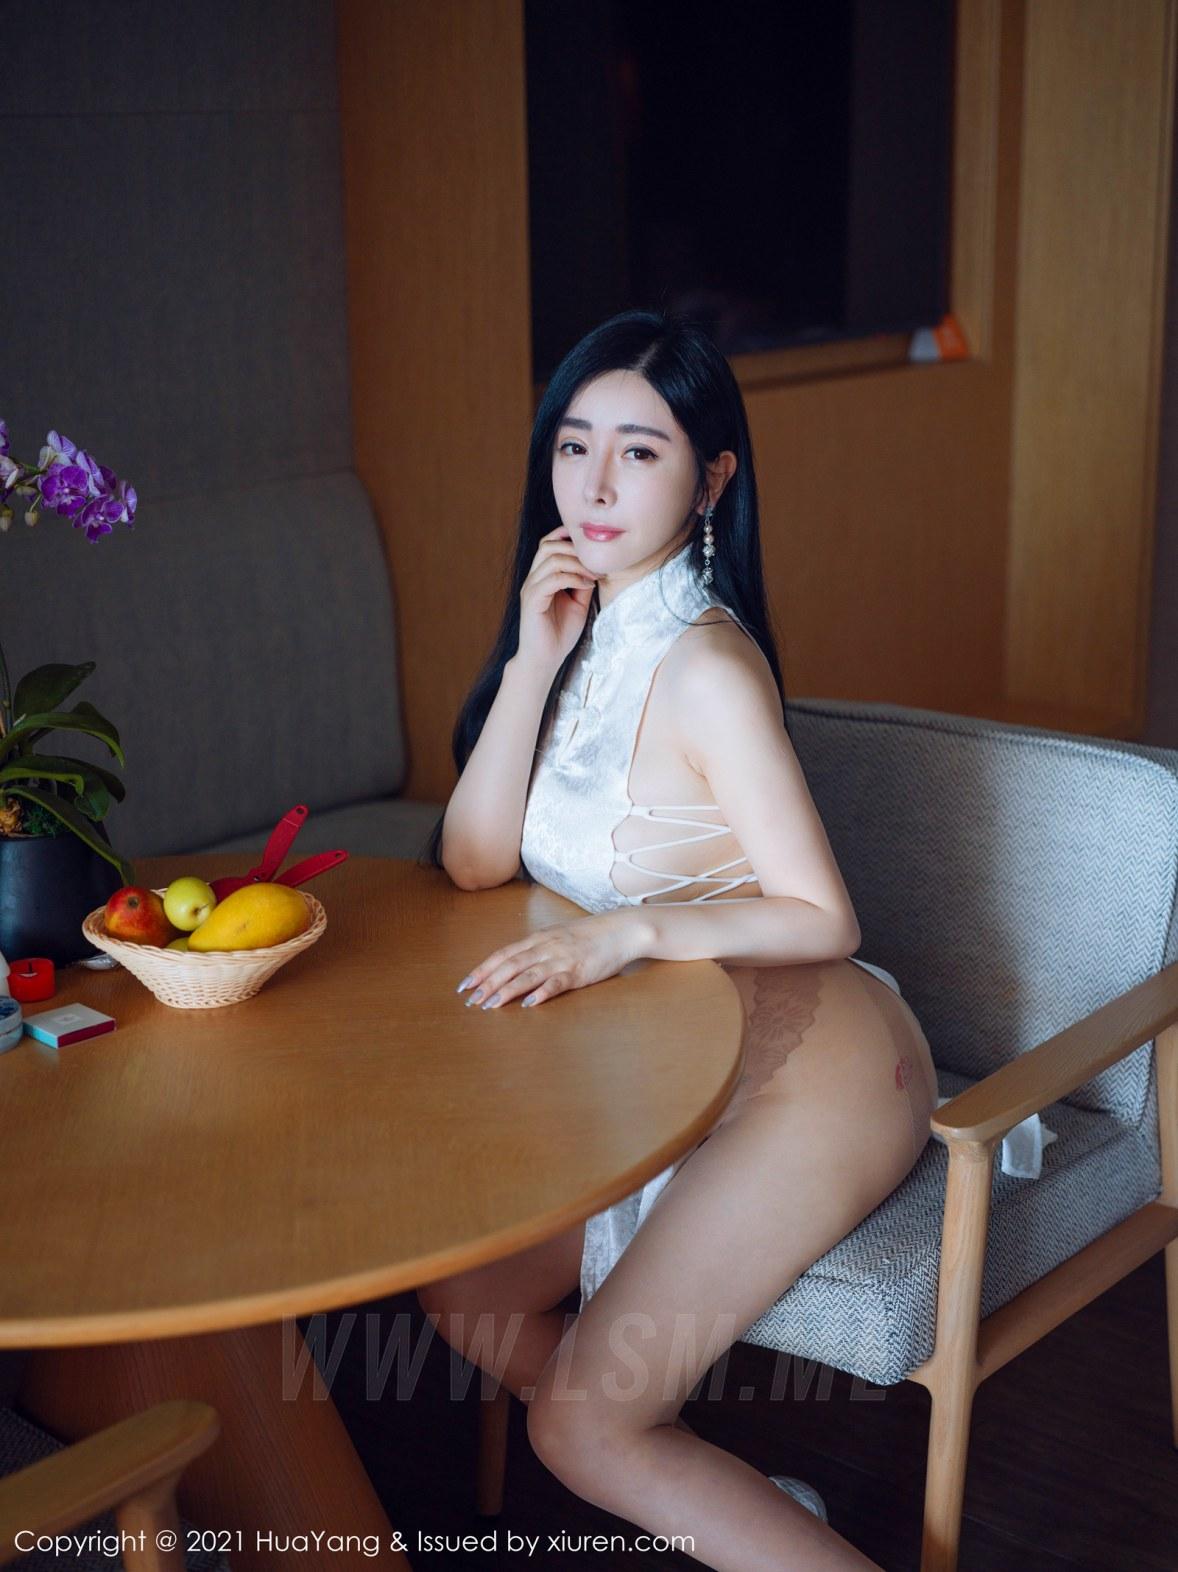 HuaYang 花漾show Vol.392 古典浪漫旗袍 允爾 三亚旅拍写真 - 1